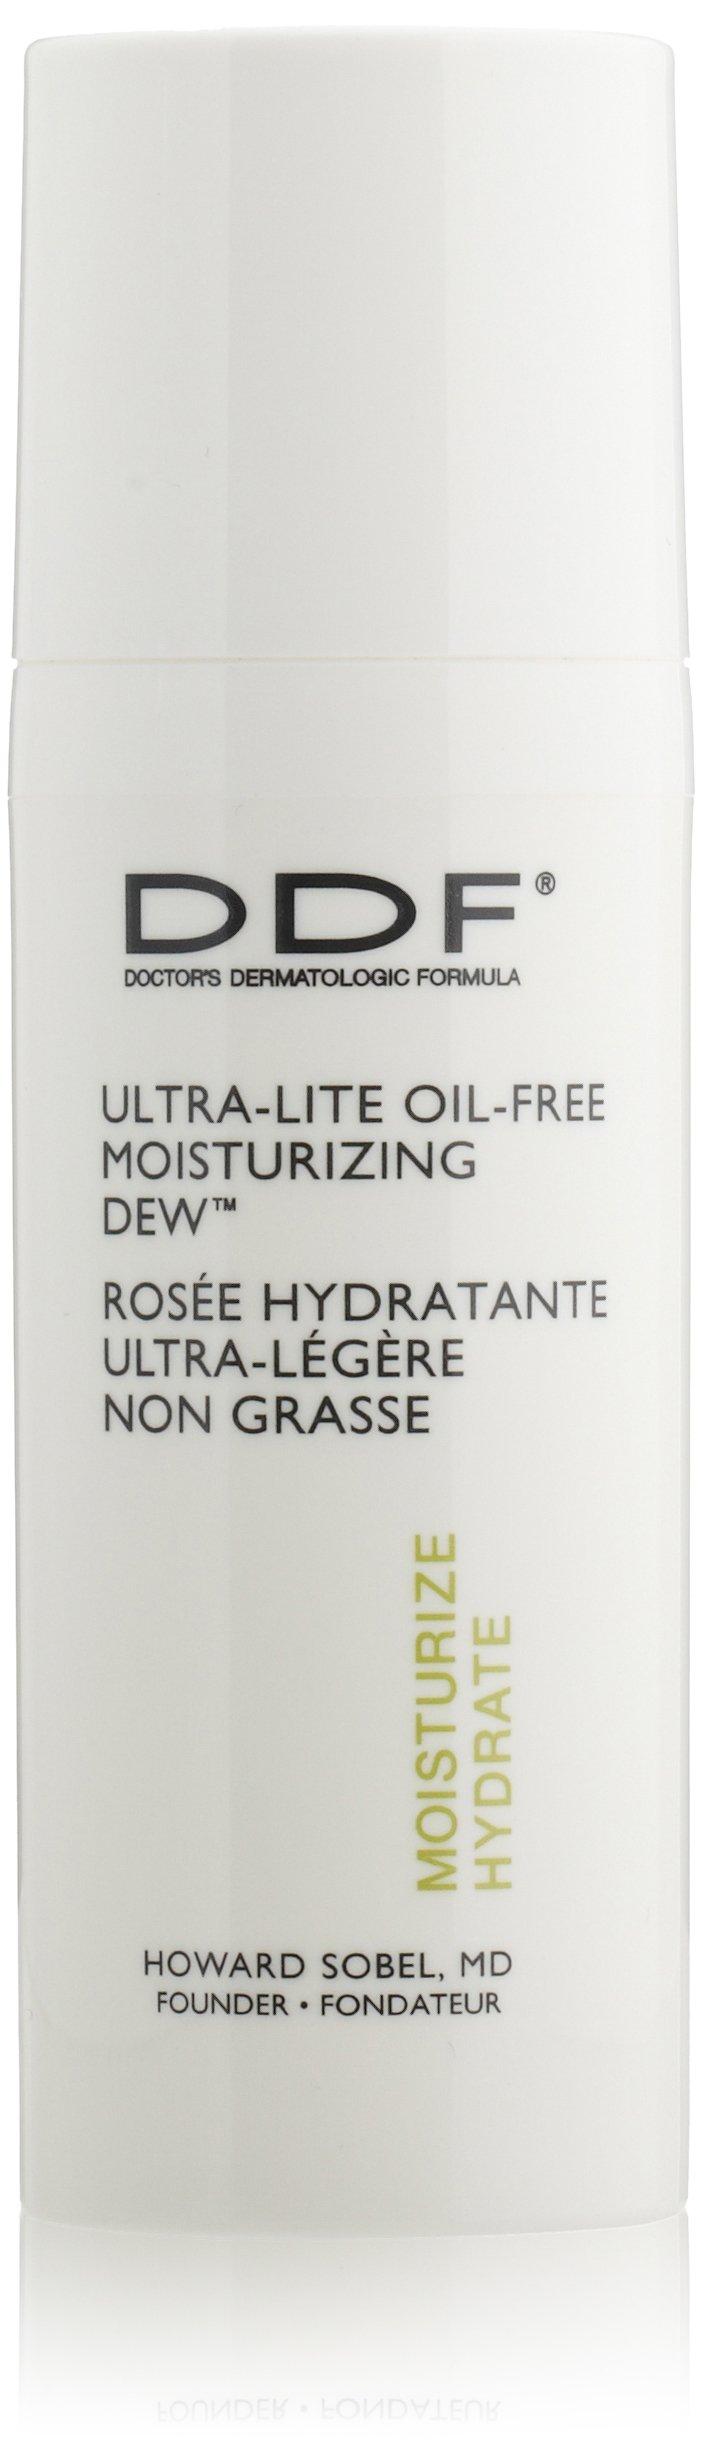 DDF Ultra-Lite Oil-Free Moisturizing Dew, 1.7 Oz.